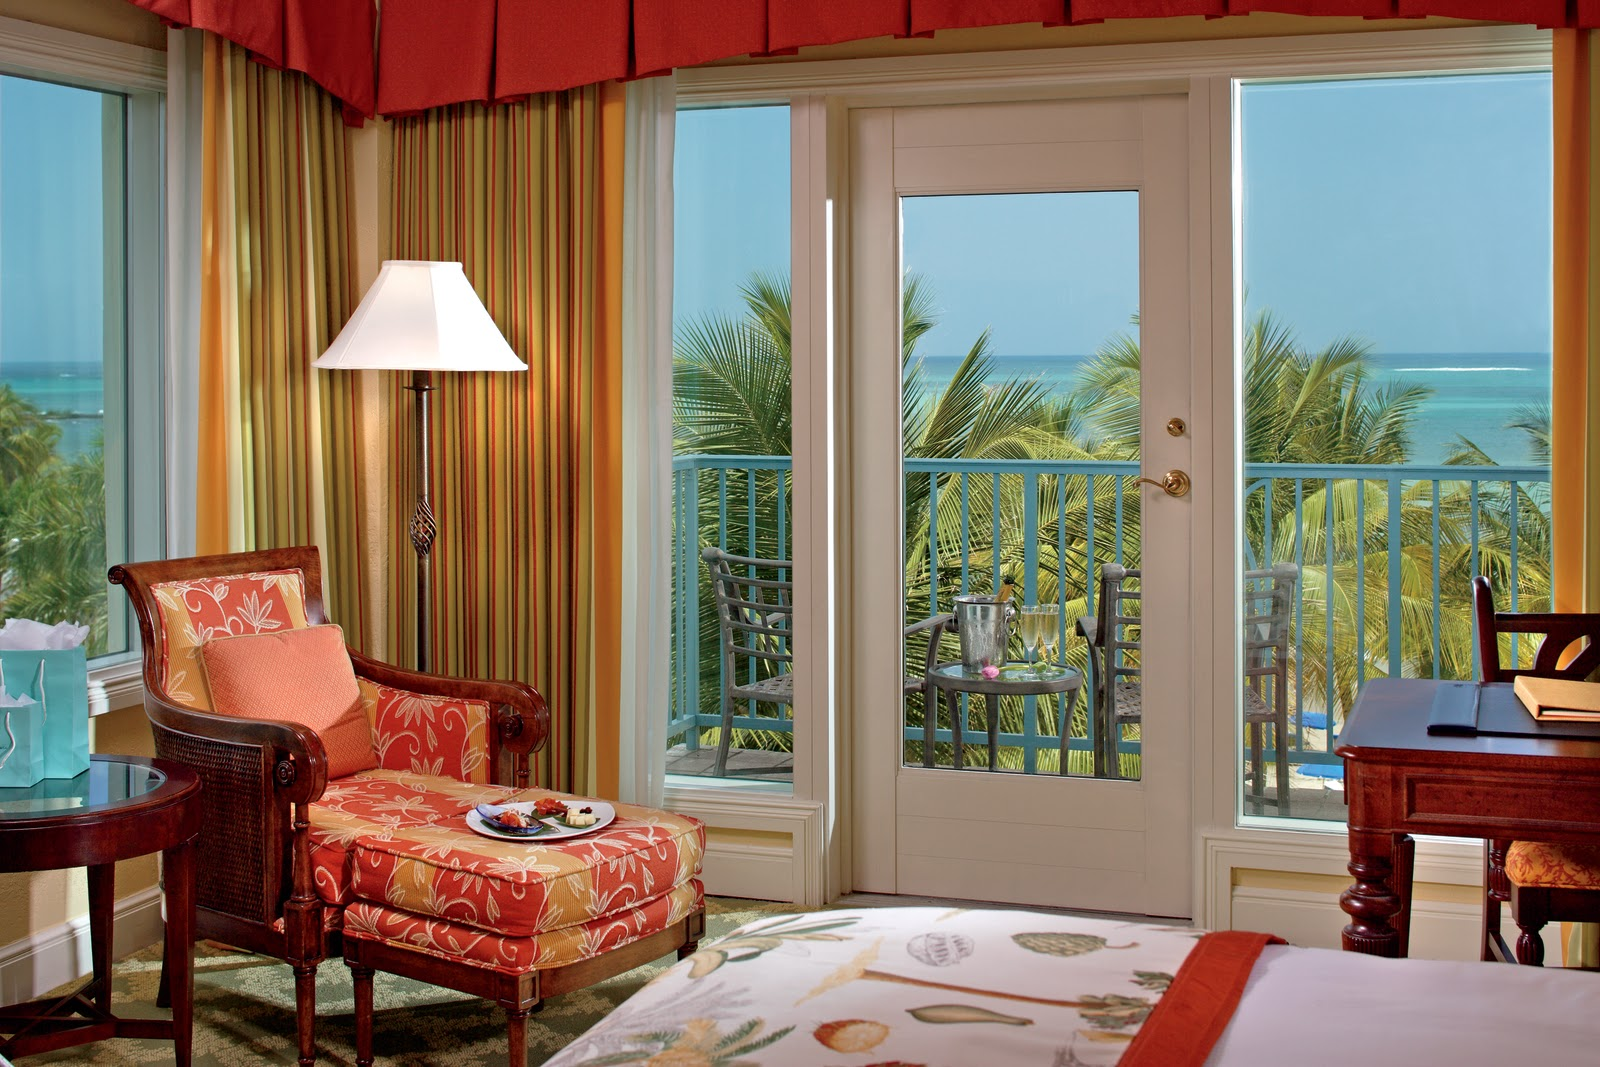 Ritz carlton san juan hotel spa and casino casino laguna mar resort